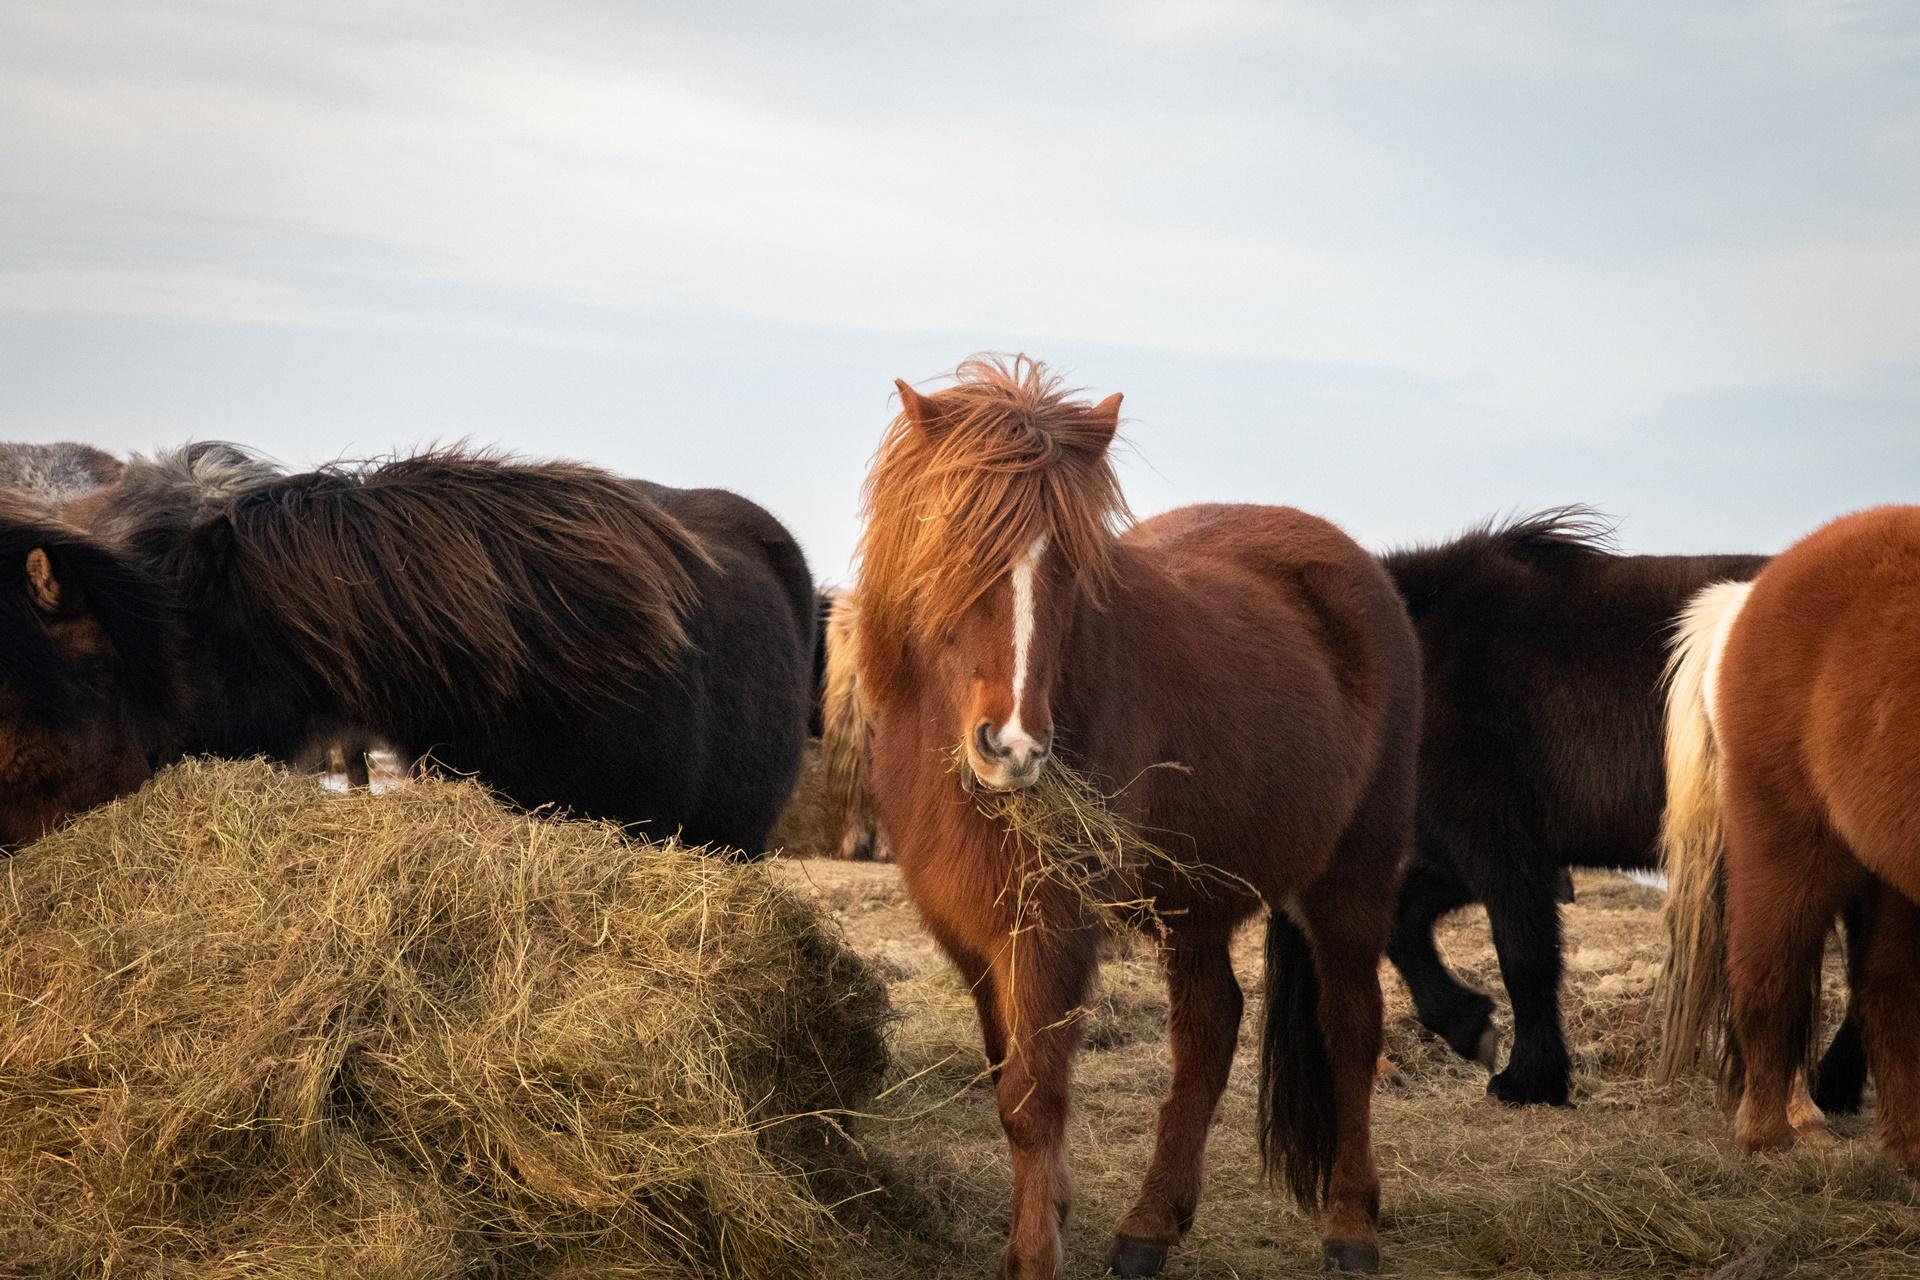 Islandpferd icelandic horse